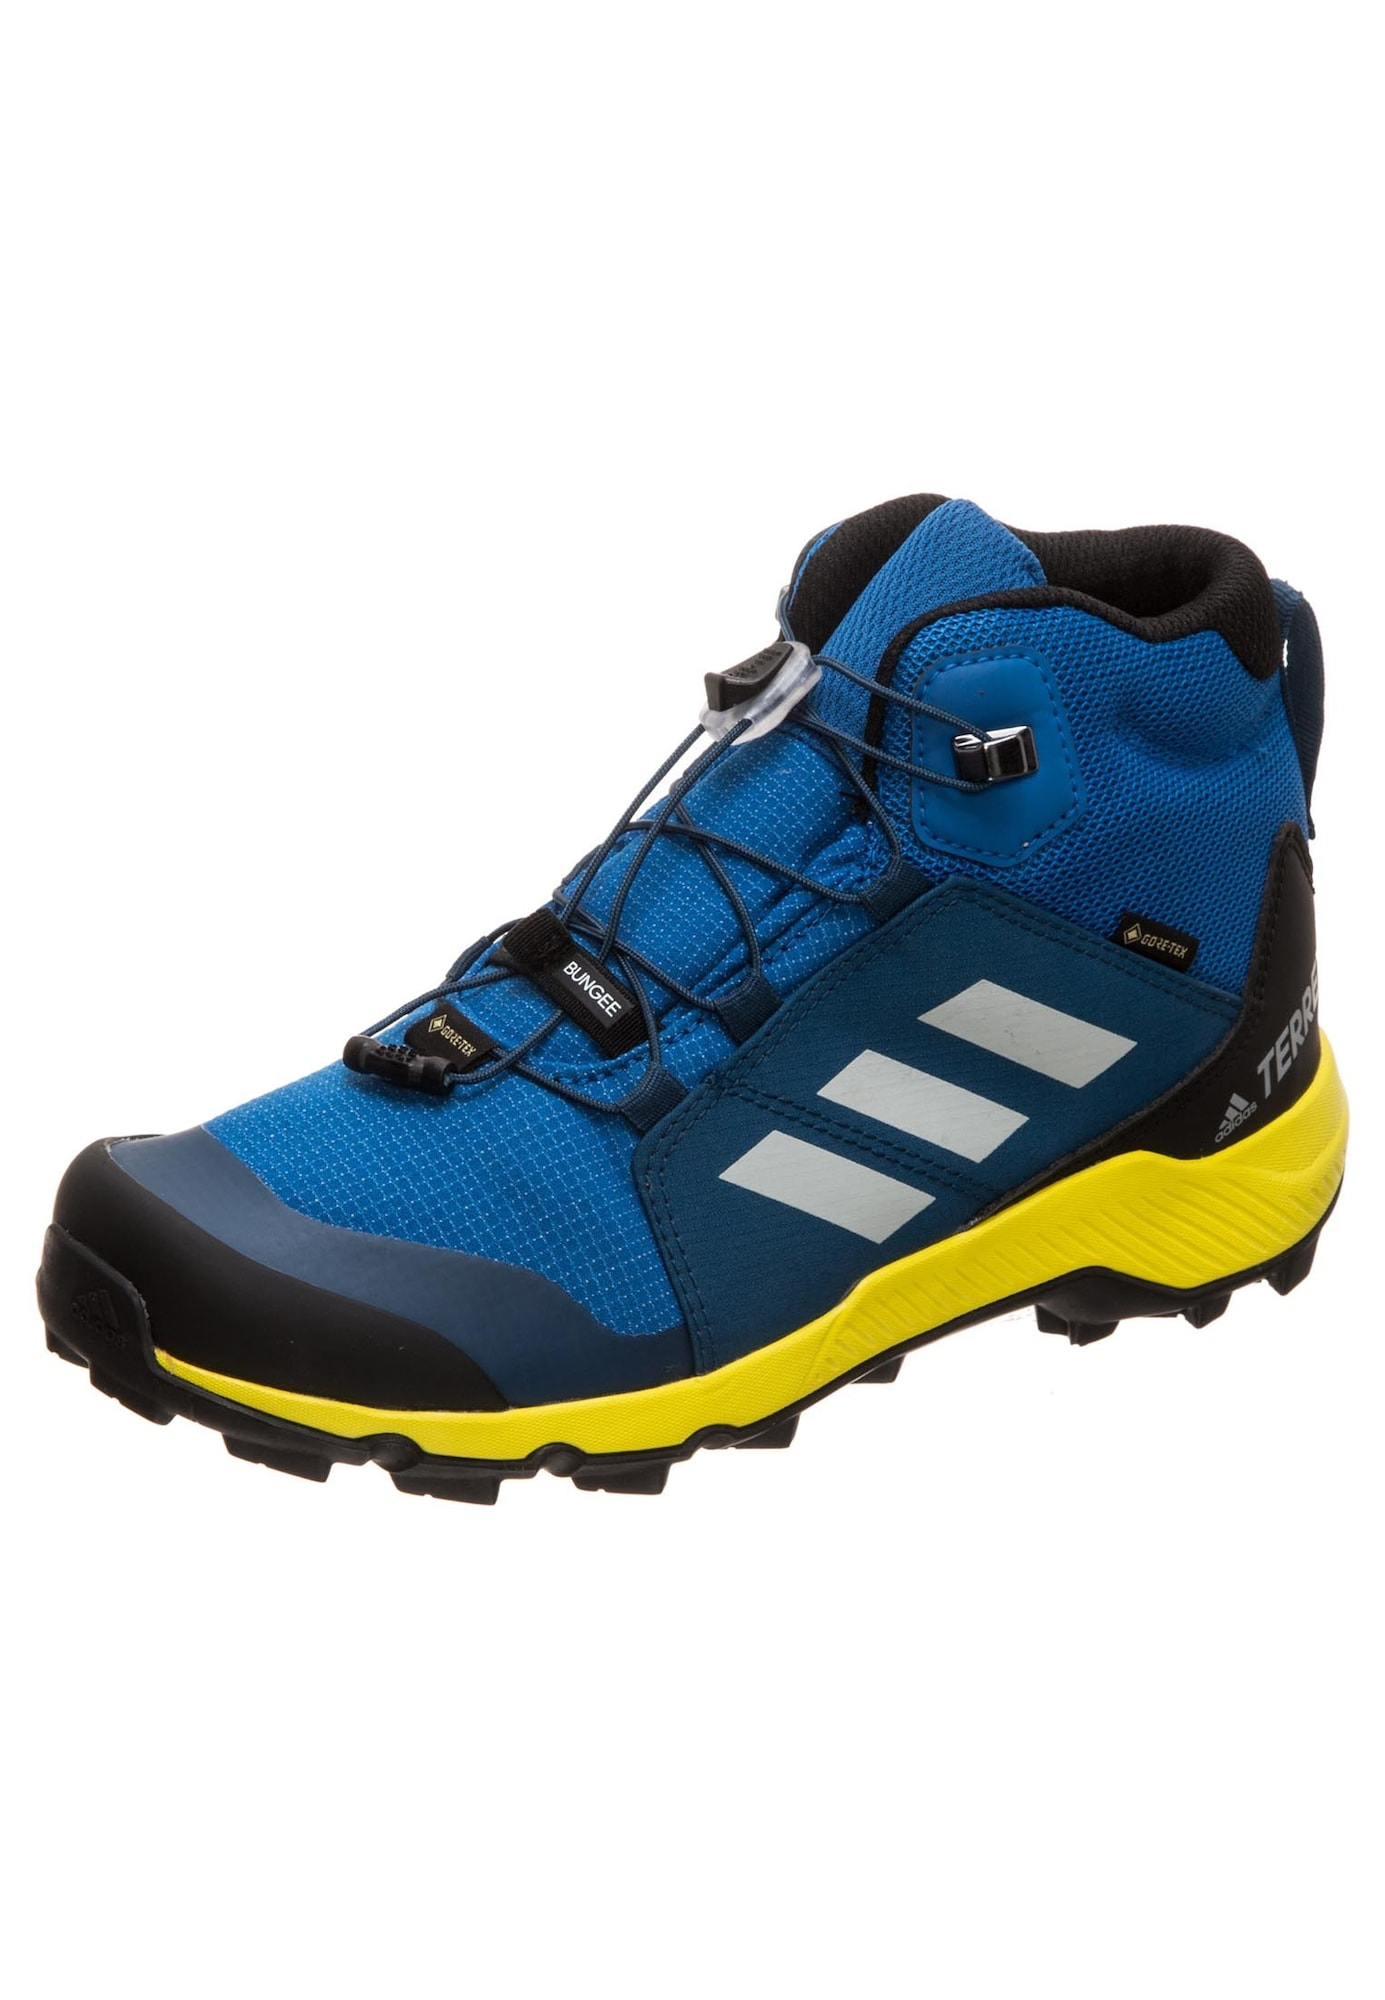 ADIDAS PERFORMANCE Auliniai batai 'Terrex Mid GTX' sidabras / mėlyna / geltona